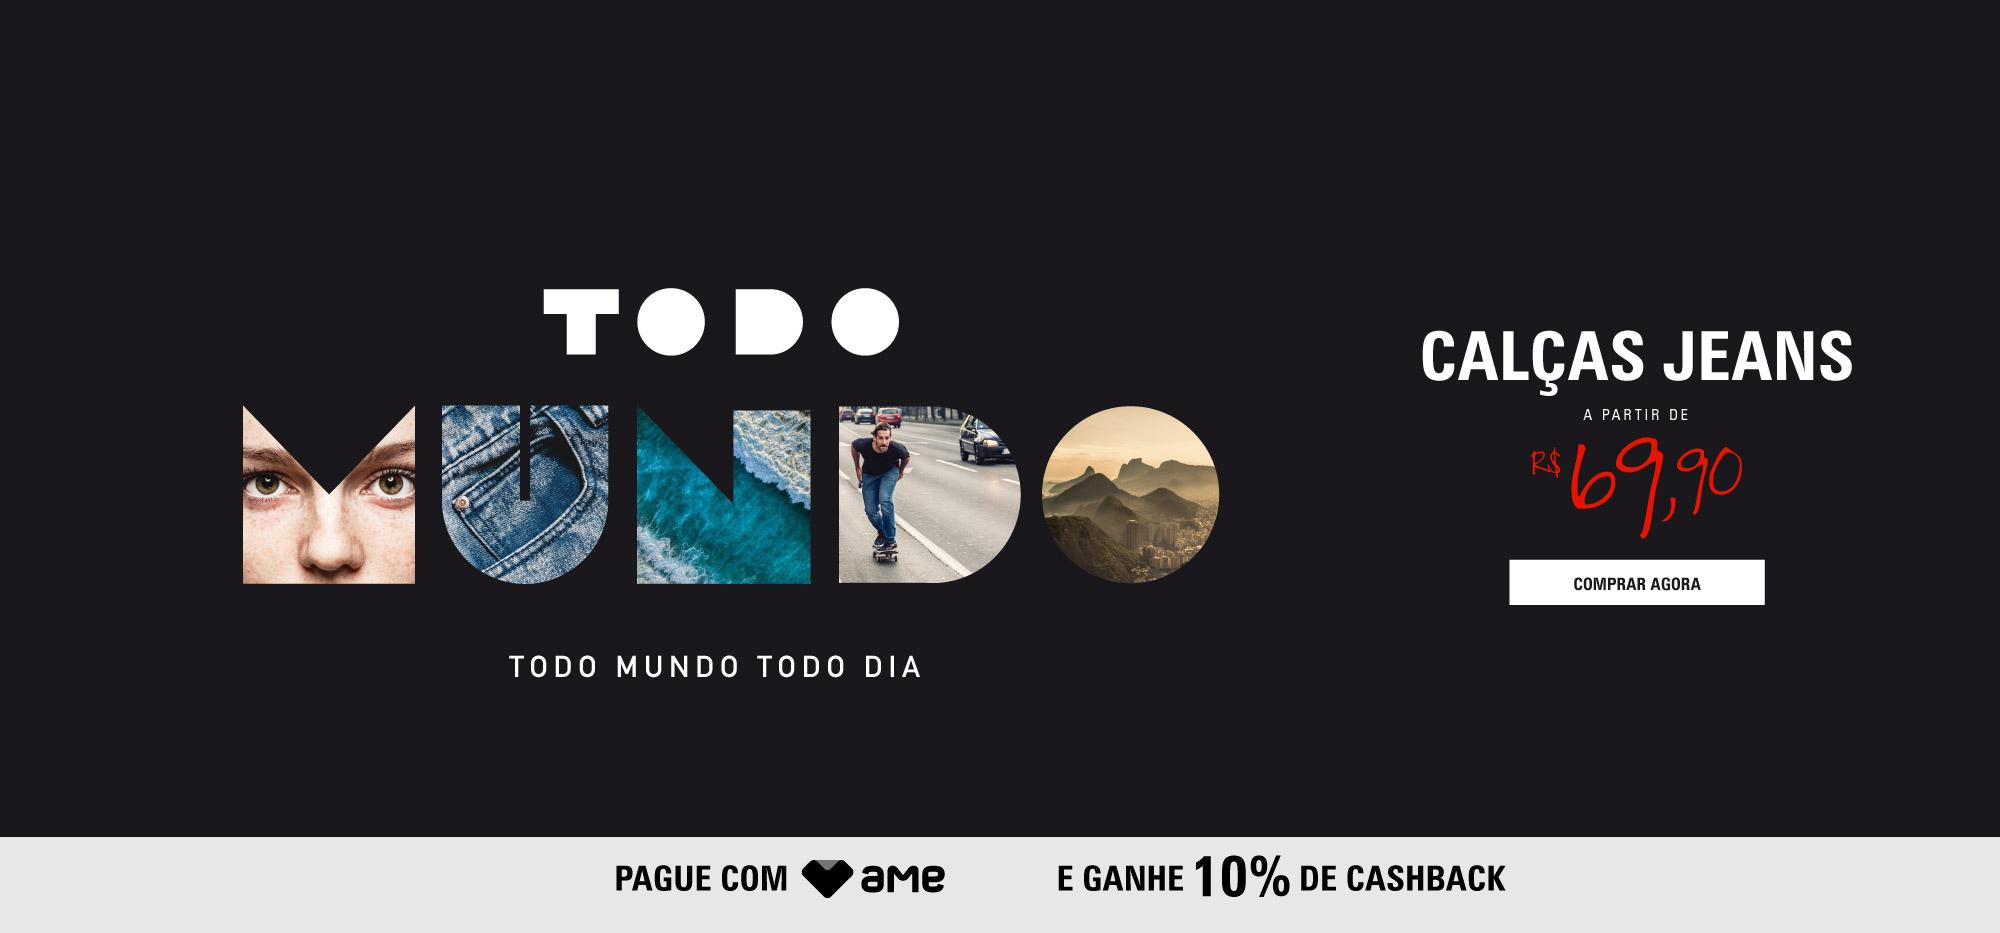 TODO MUNDO - CLARO